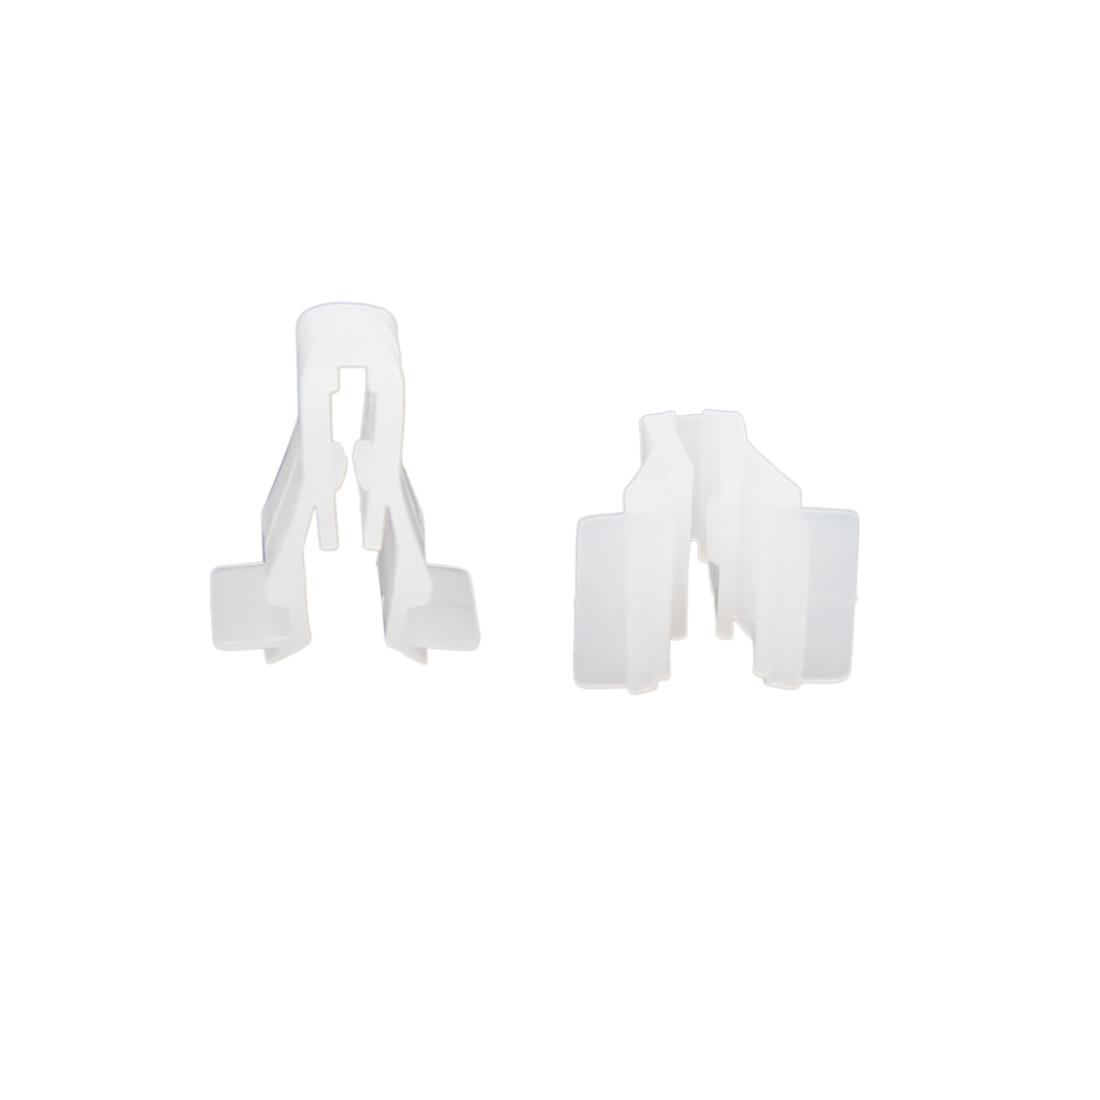 100Pcs White Plastic Rivets Door Trim Fastener Retainer Moulding Clips for Car